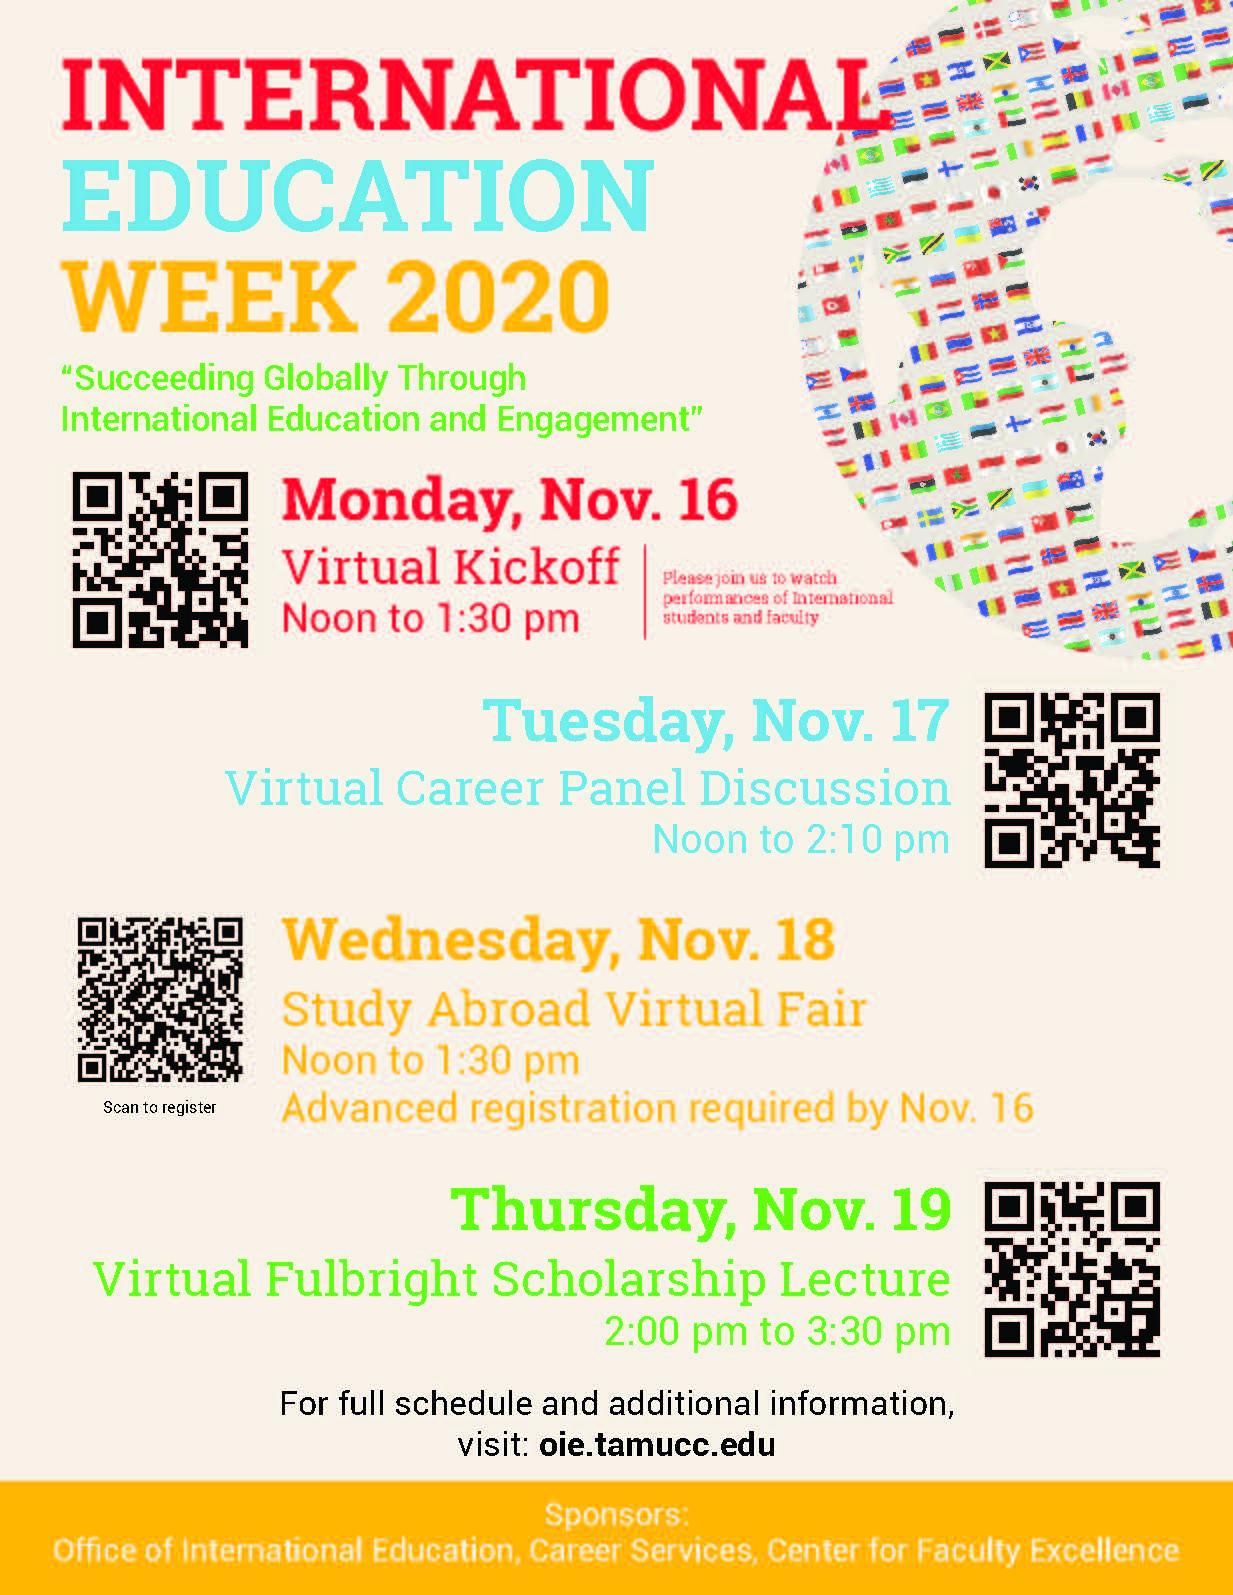 Flyer for TAMUCC's International Education Week Celebration